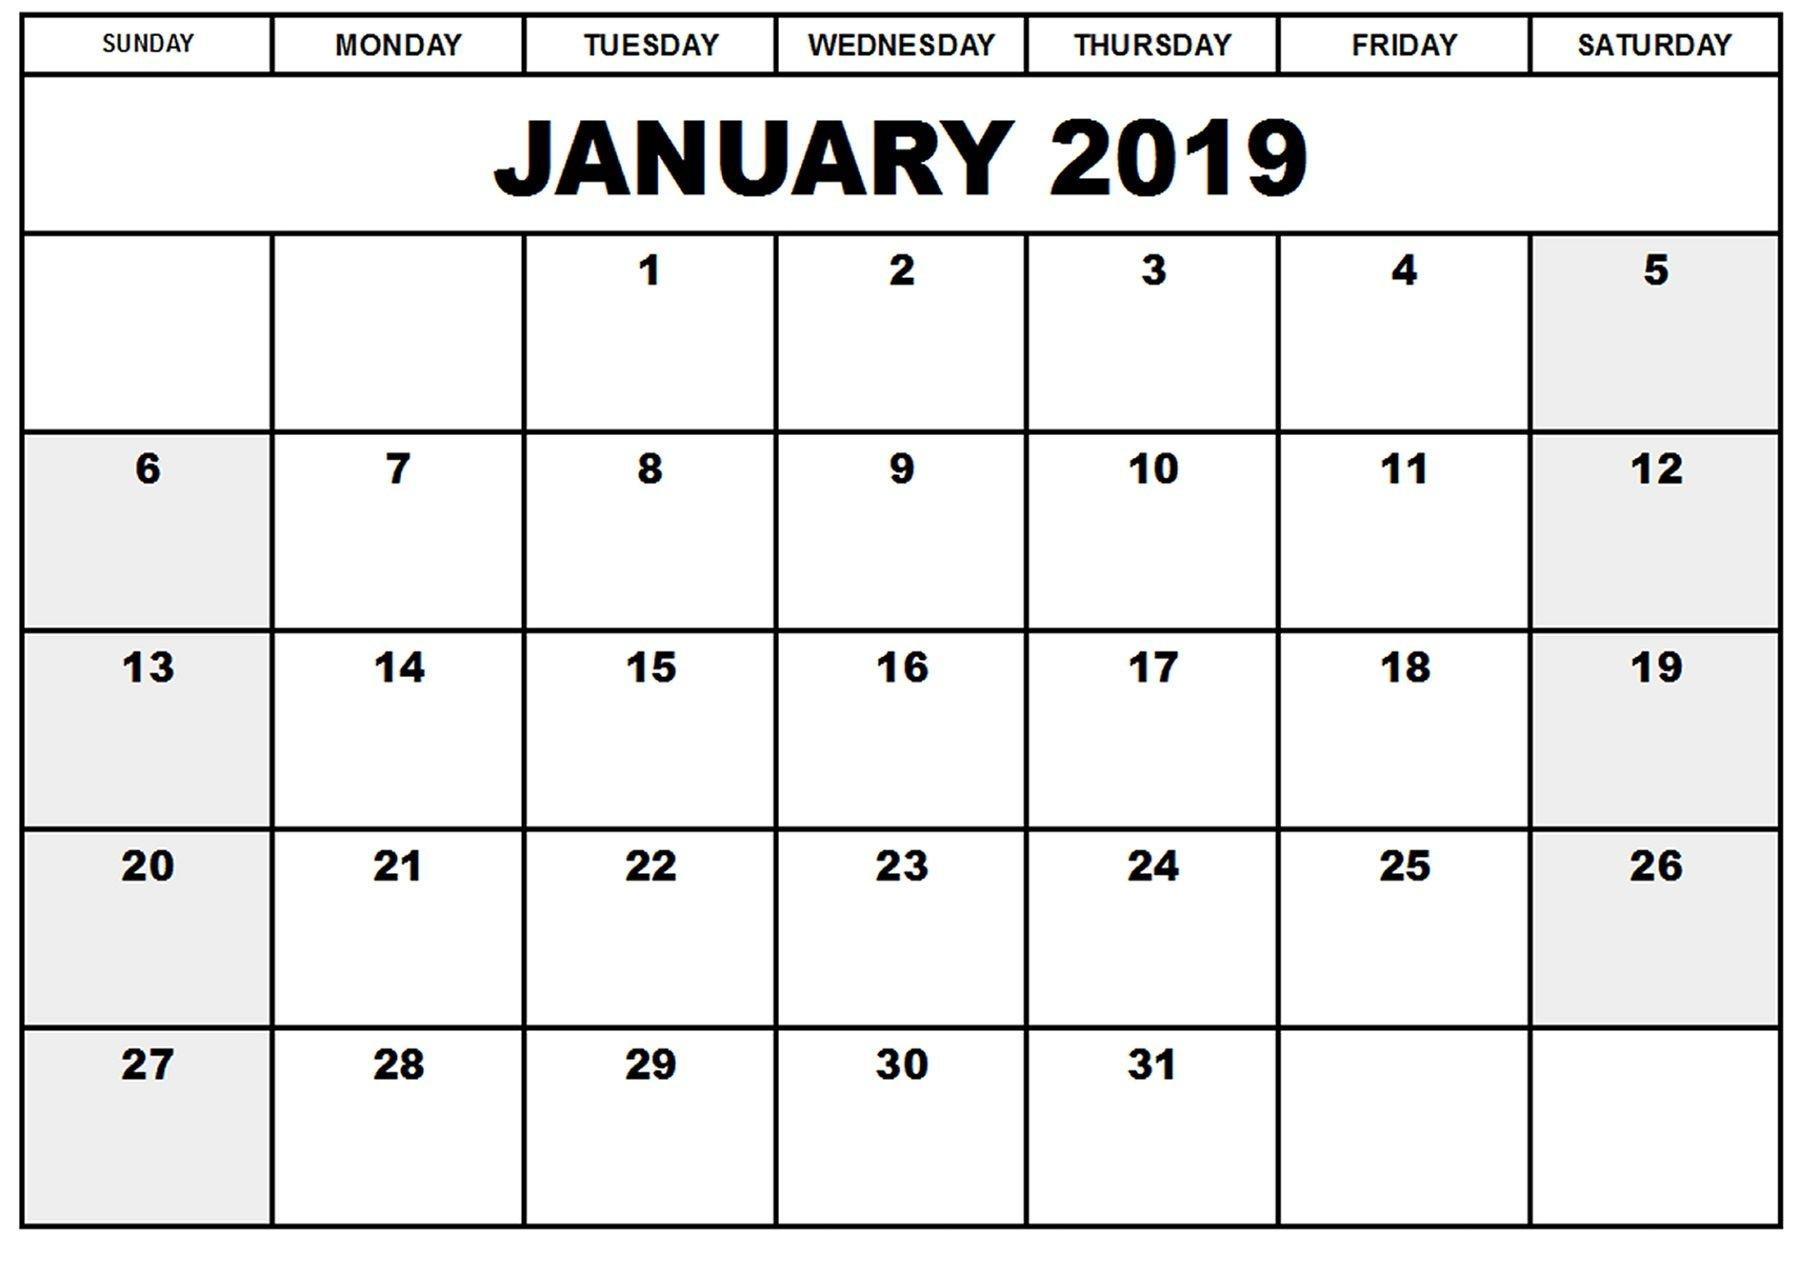 Printable Calendar 2019 January | Printable Calendar 2019 Calendar 2019 January Printable